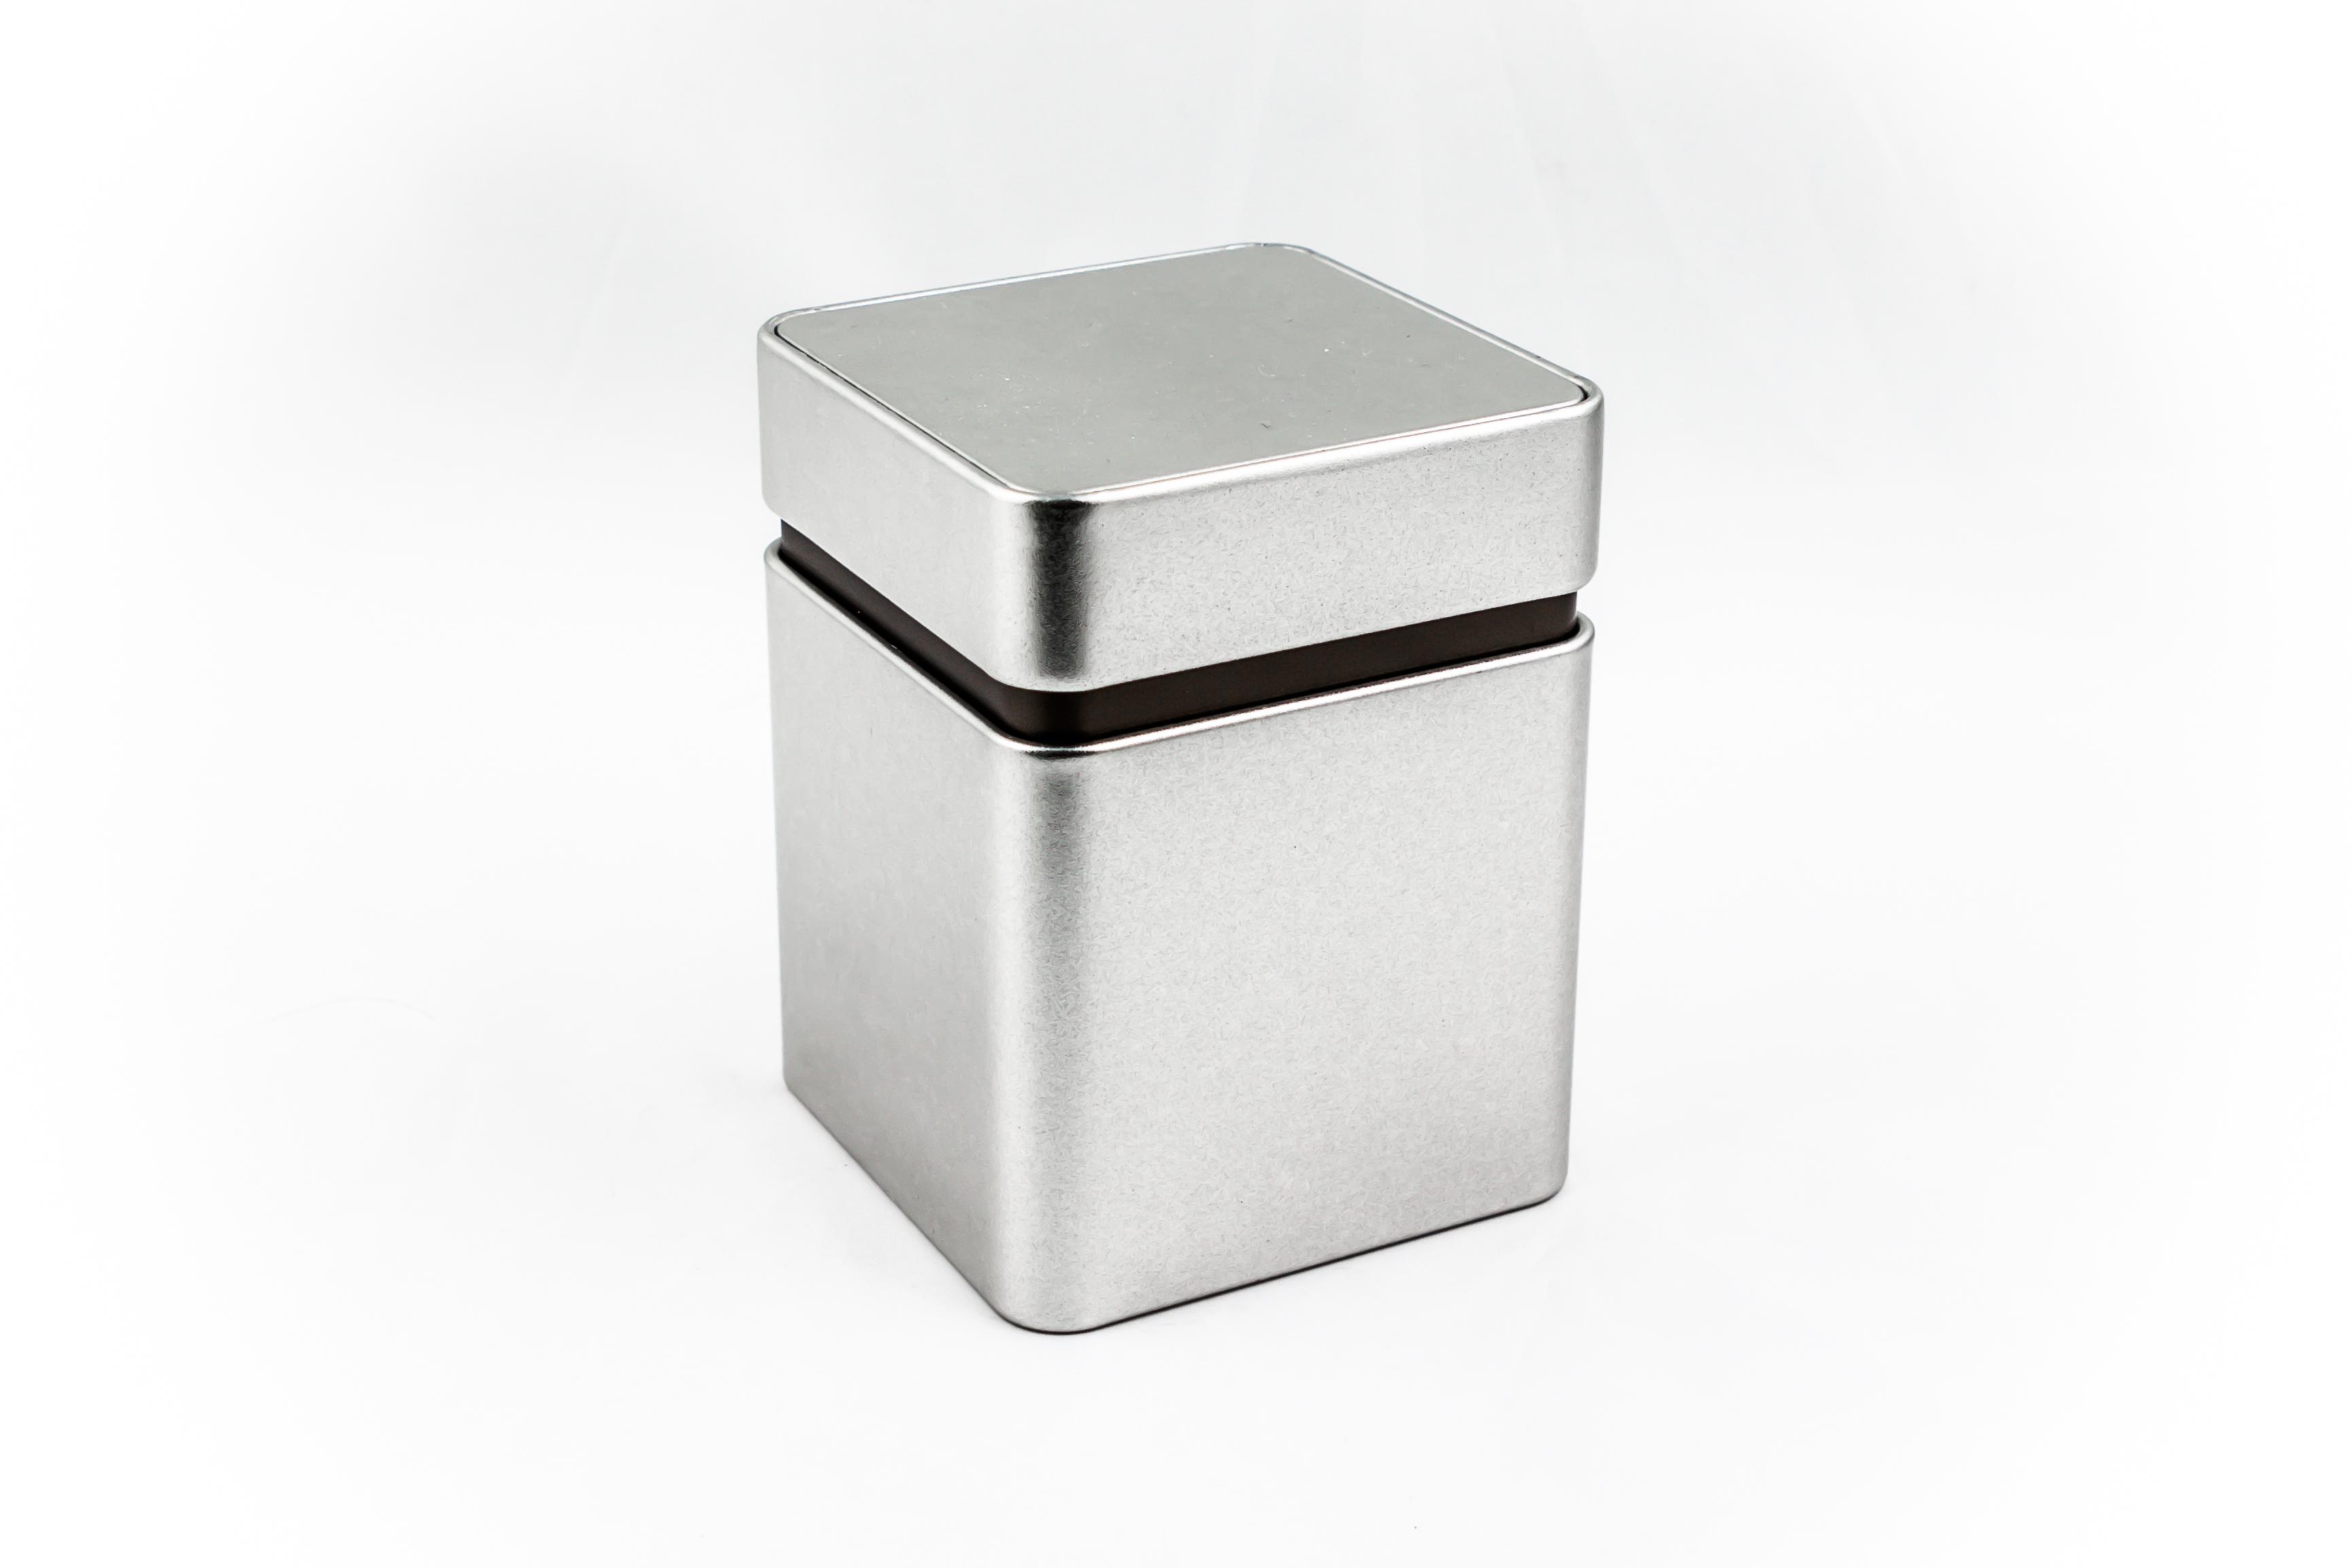 Storage tinbox, premium, small, sandblast material